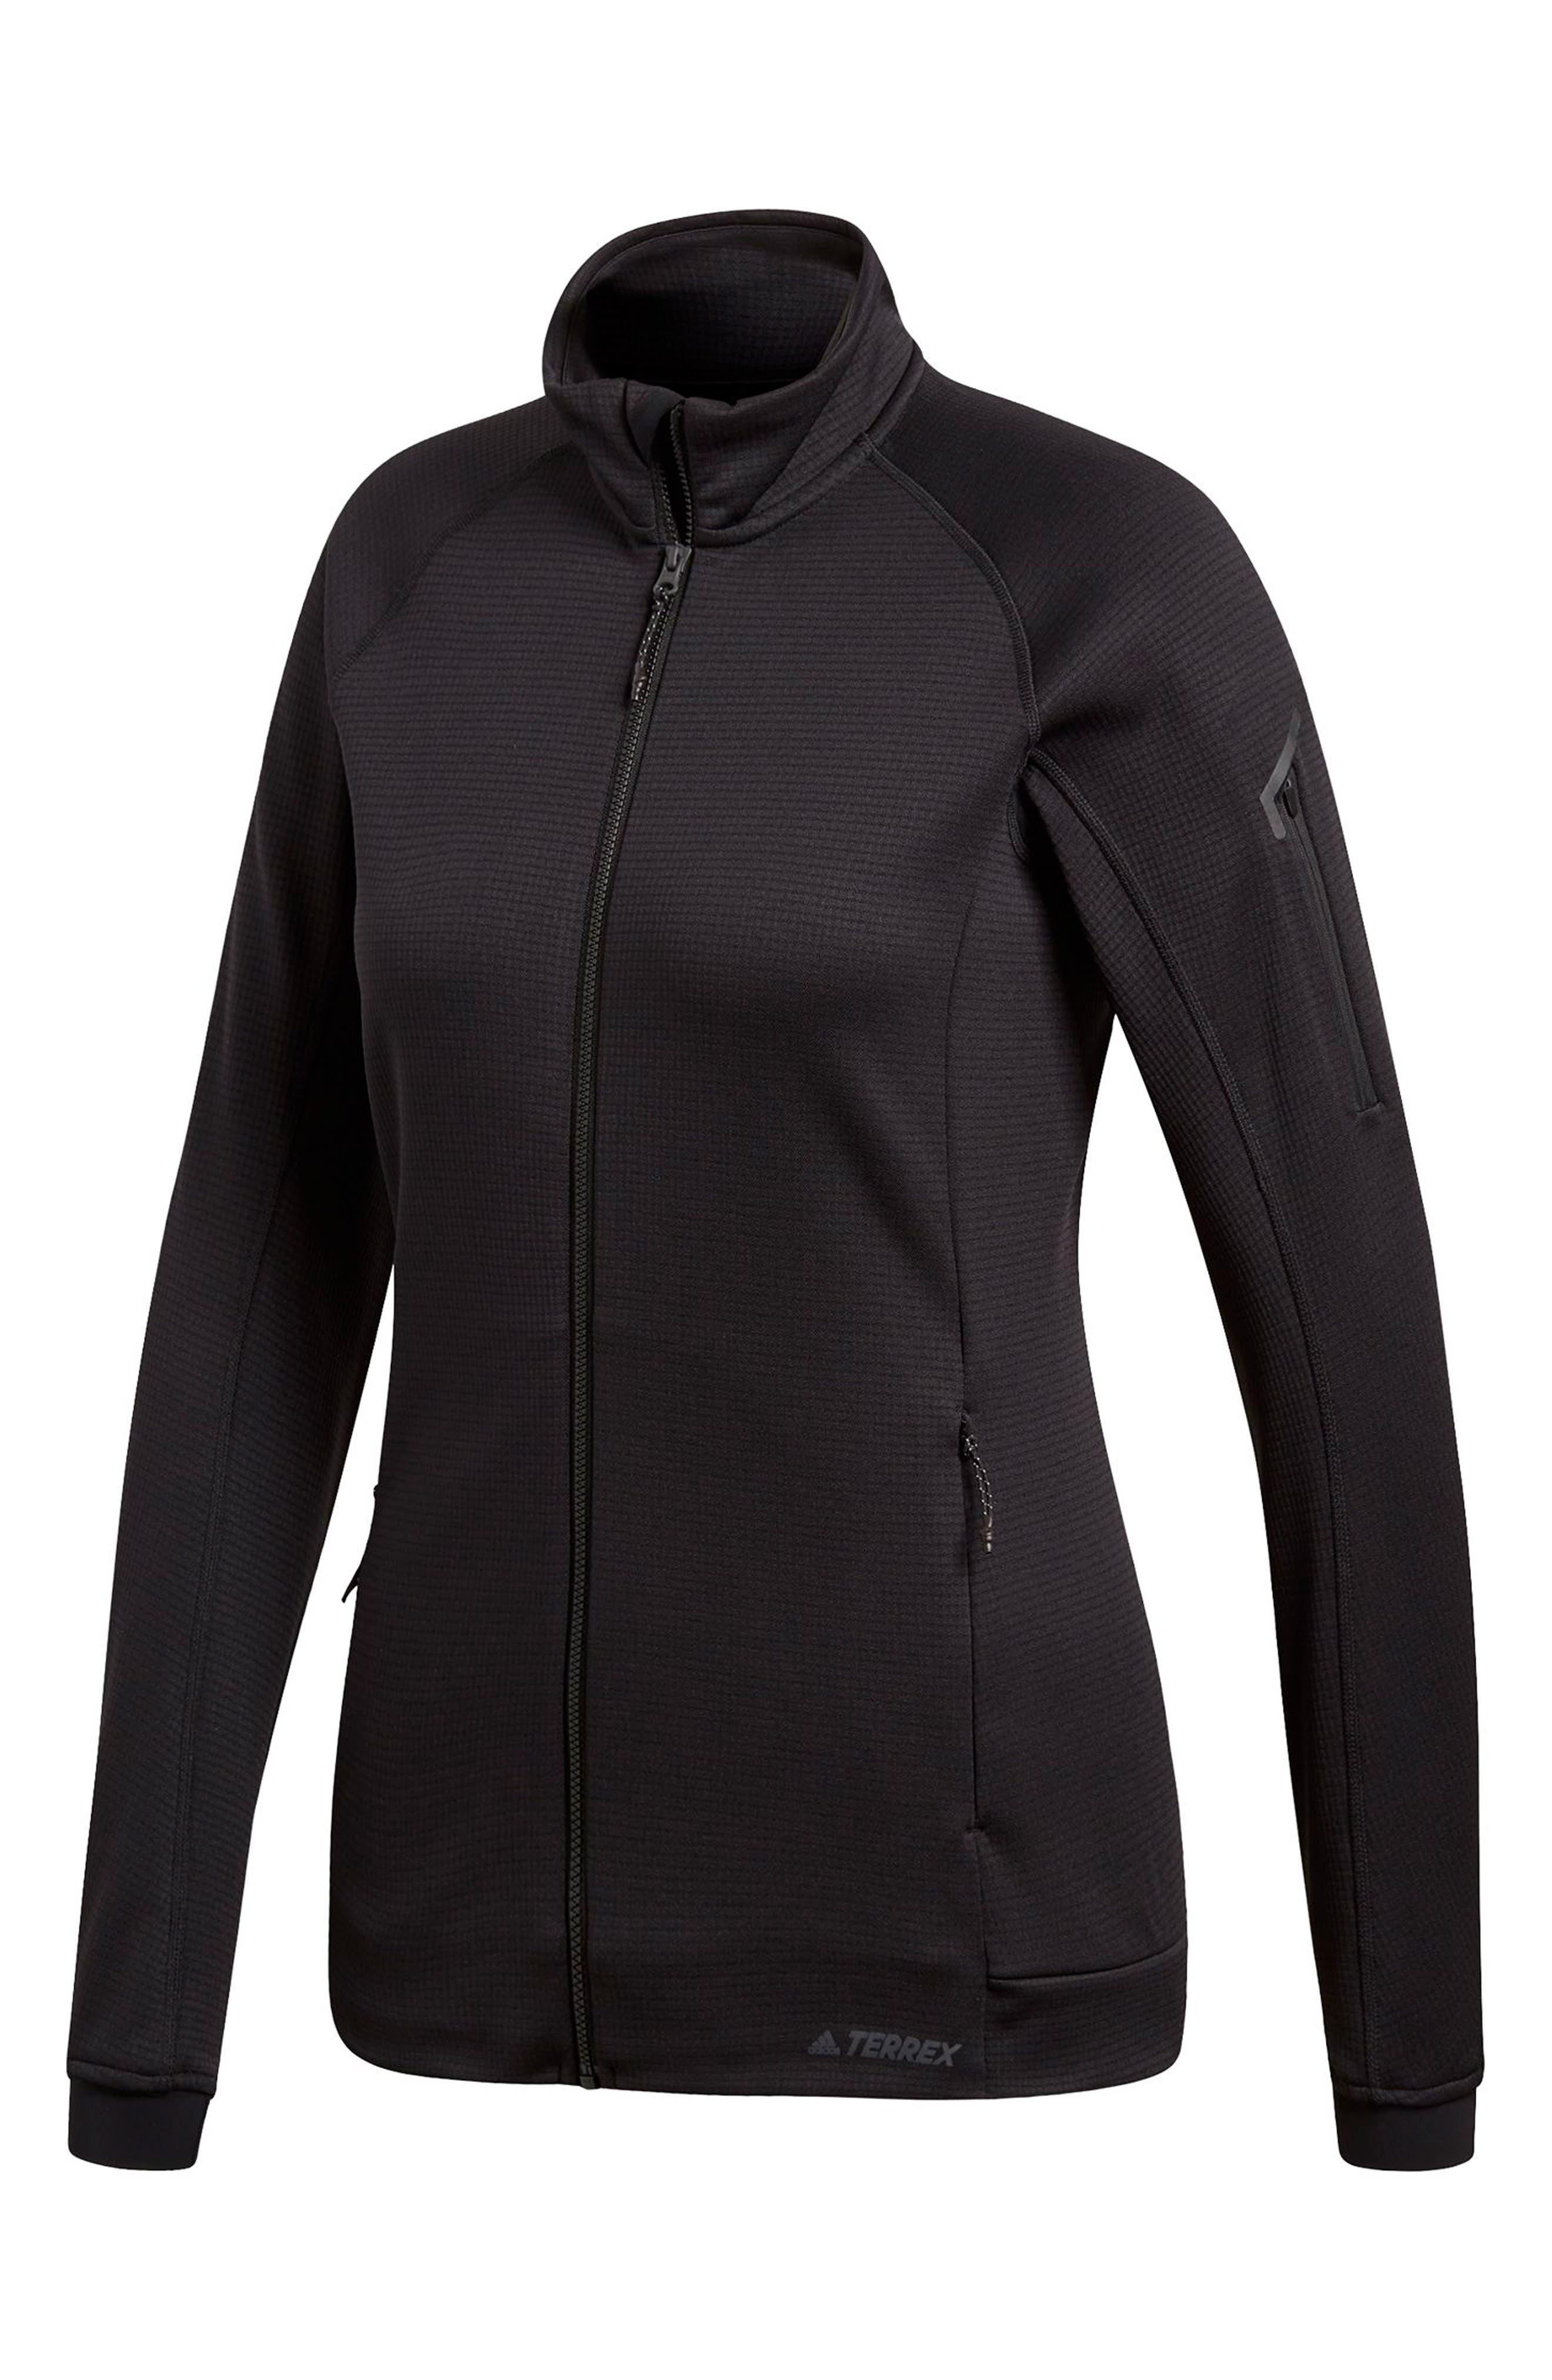 ADIDAS, Stockhorn Fleece Jacket, Alternate thumbnail 6, color, BLACK